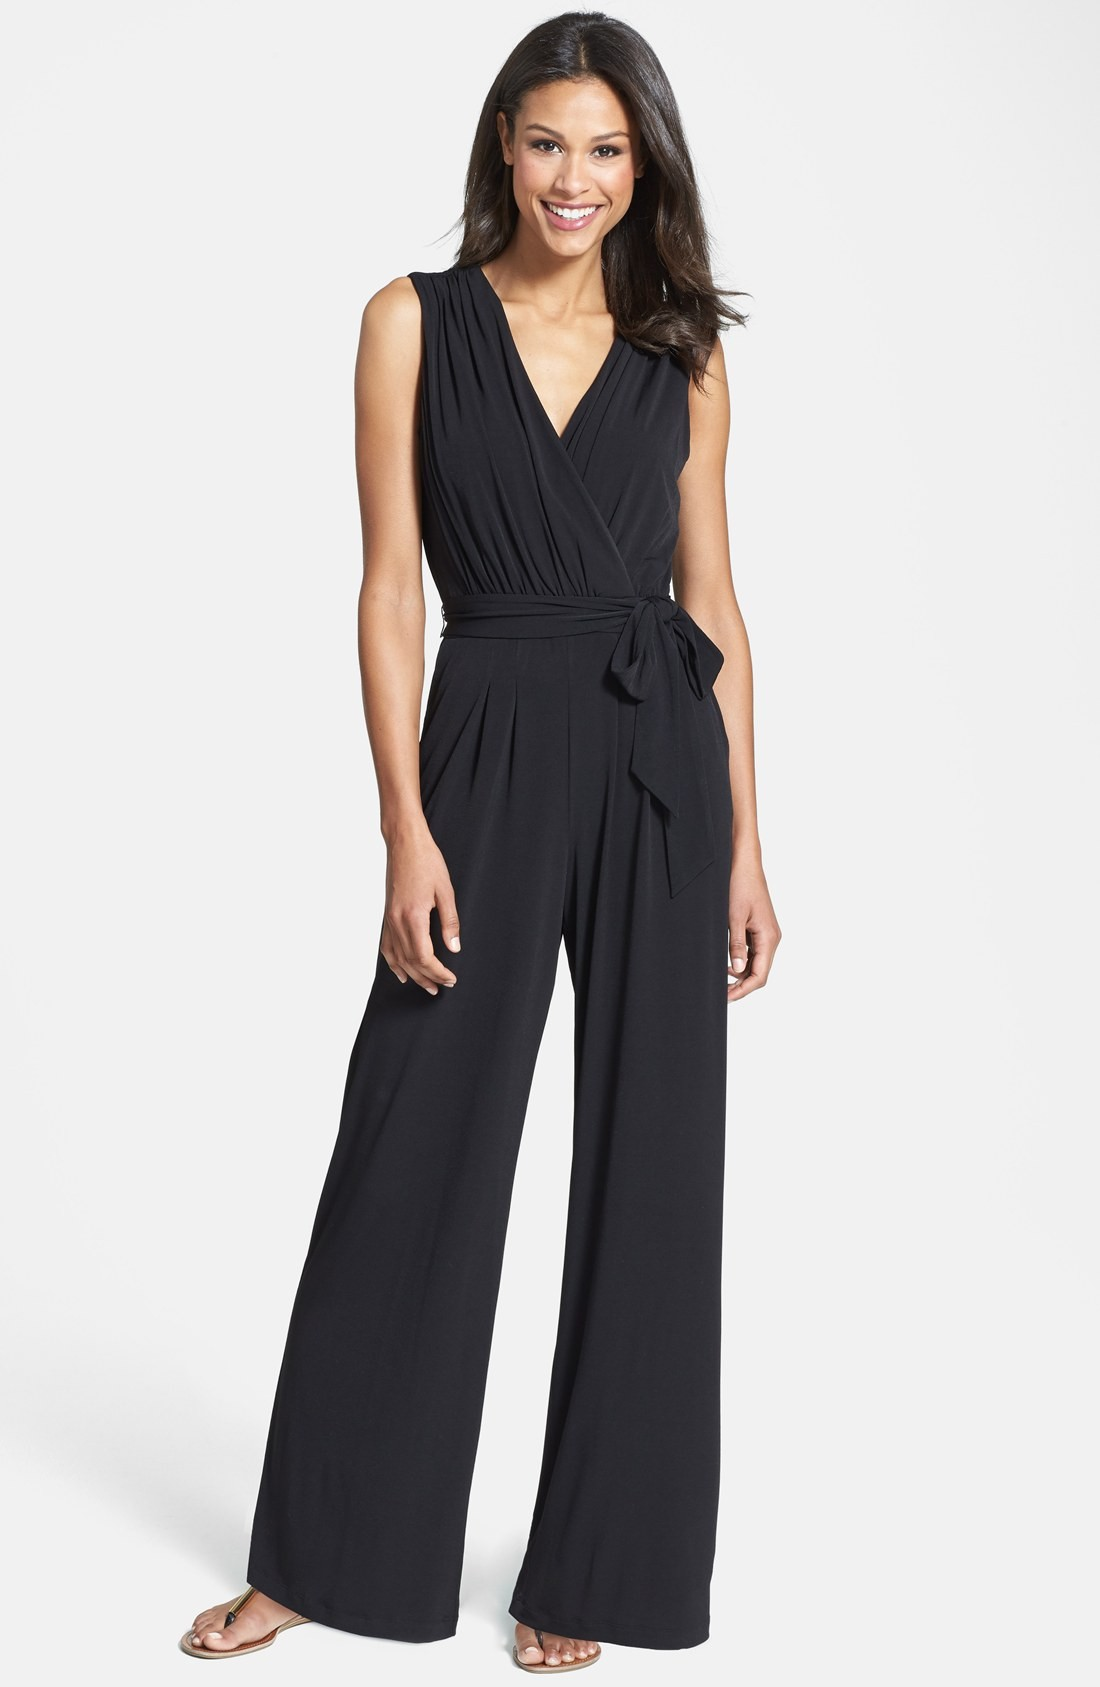 black jumpsuits u0026 rompers for women | nordstrom KPTPDZD